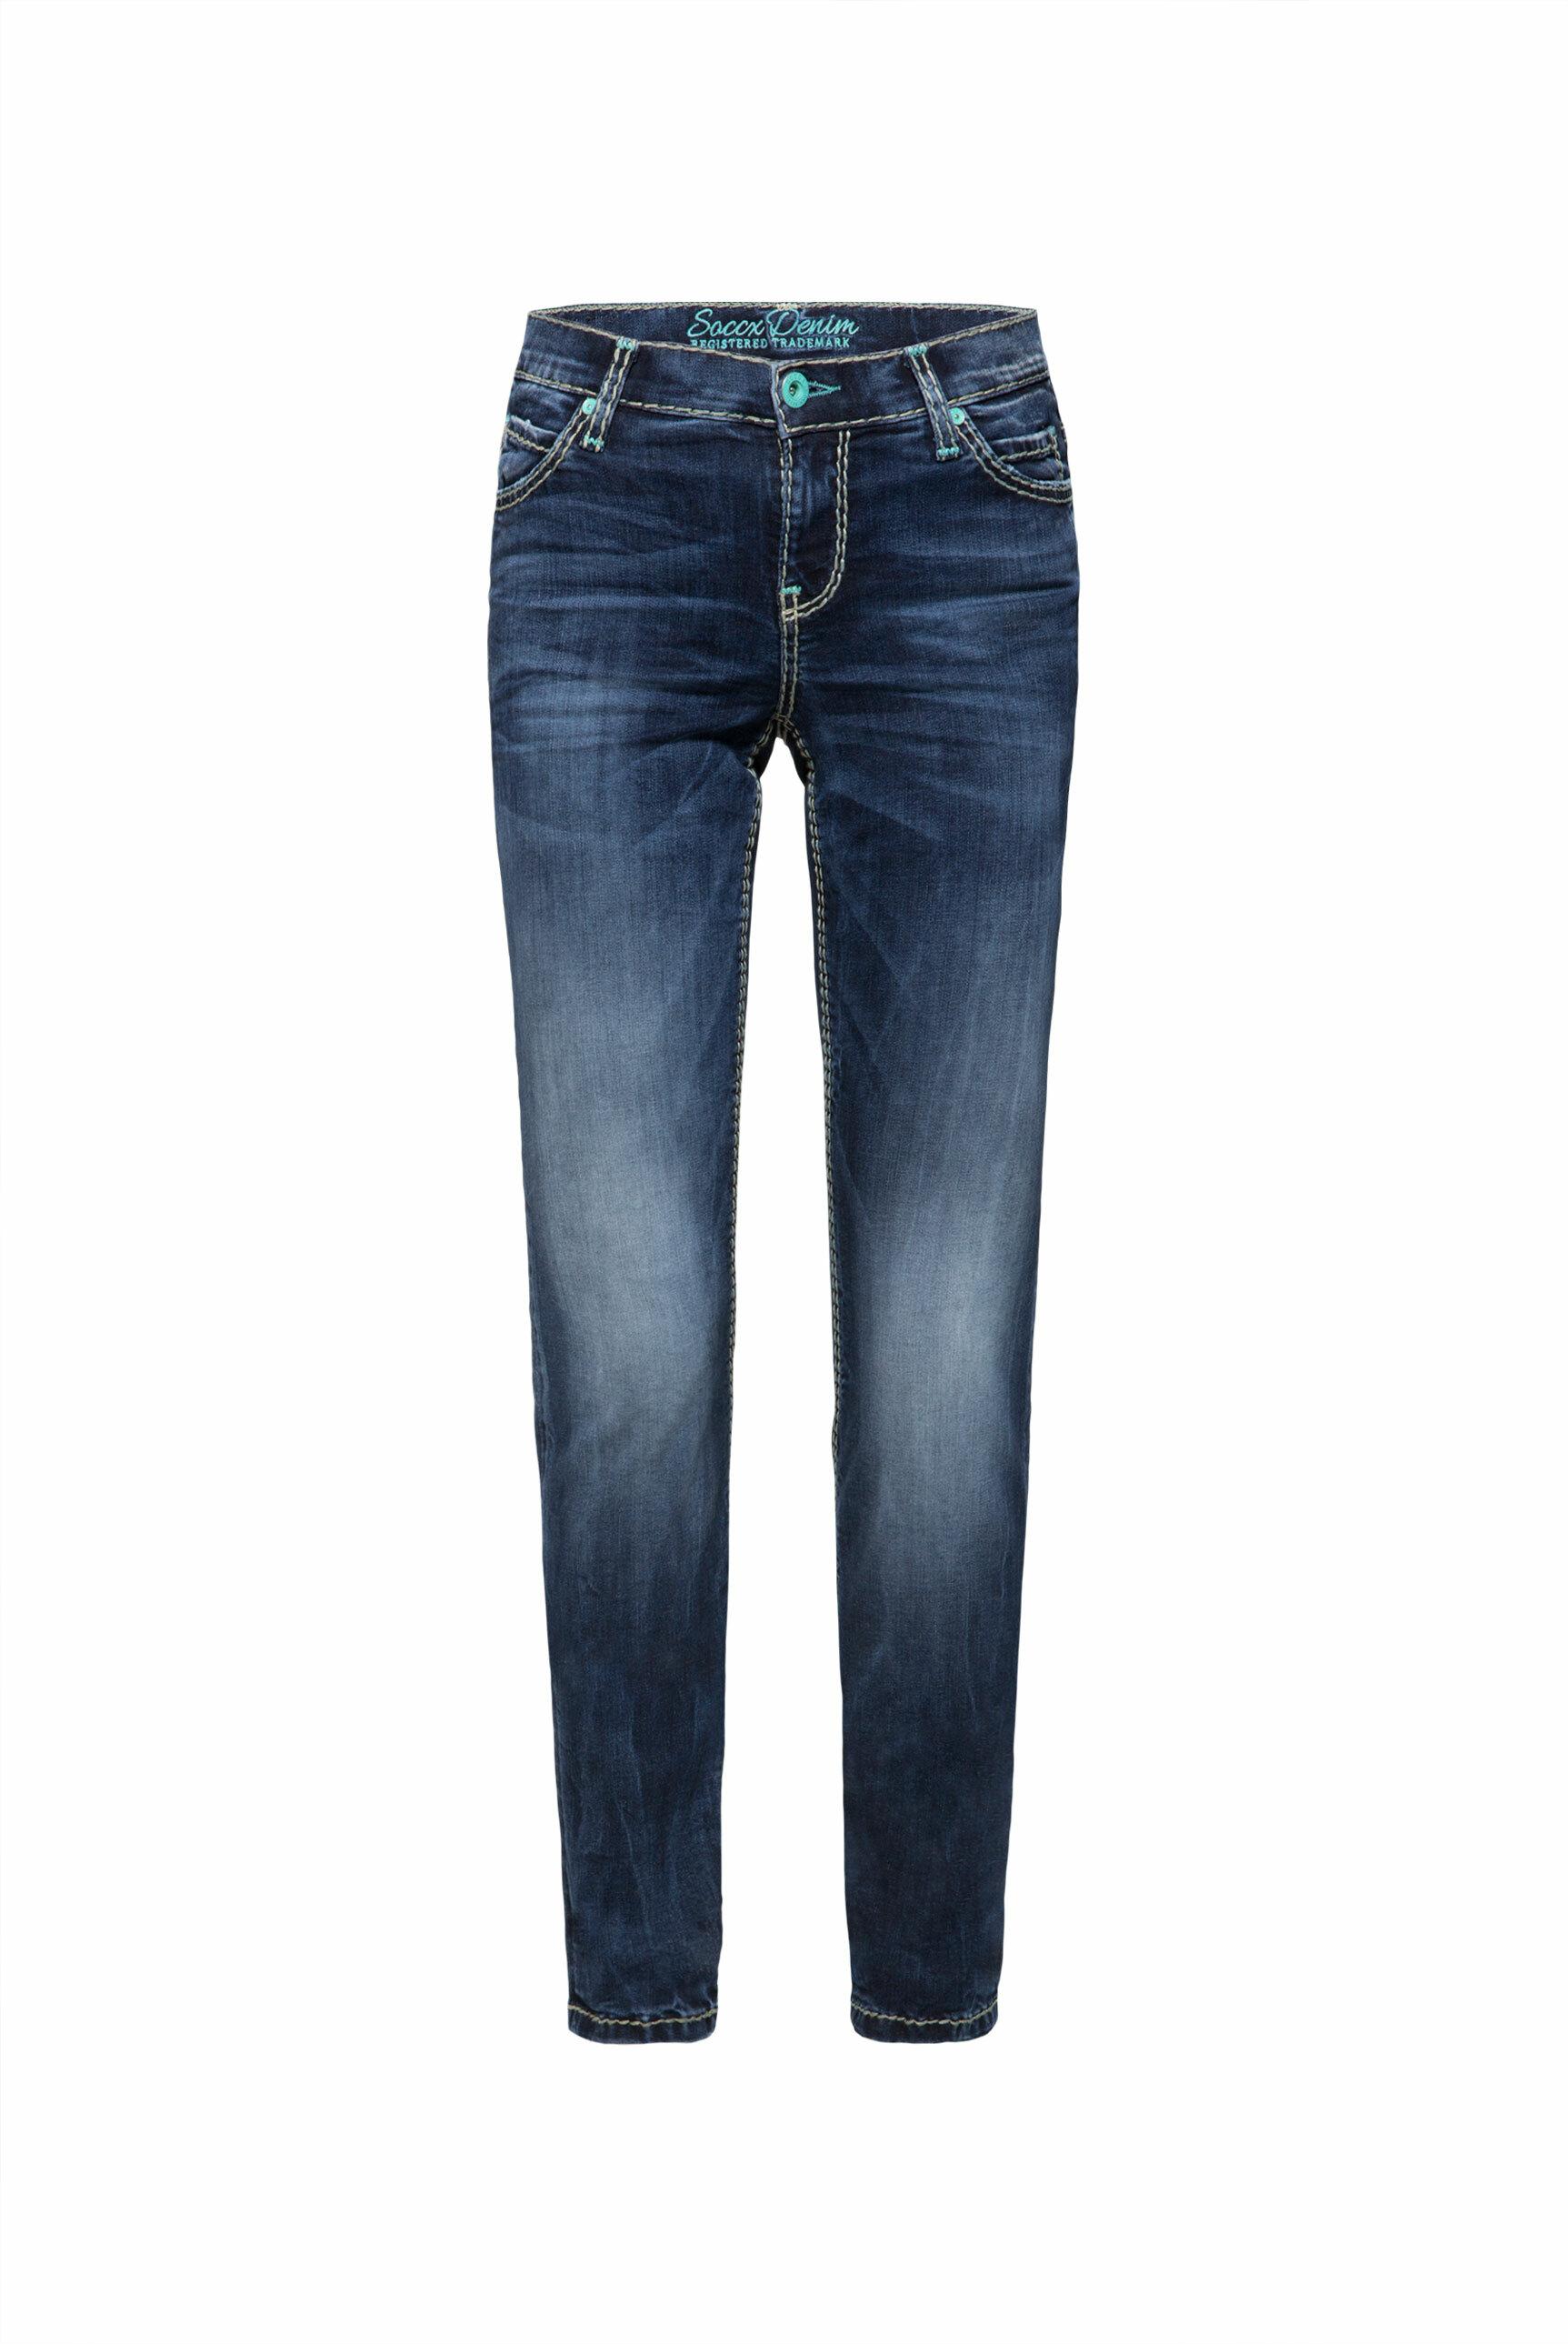 HE:DI Slim Fit Jeans mit breiten Nähten